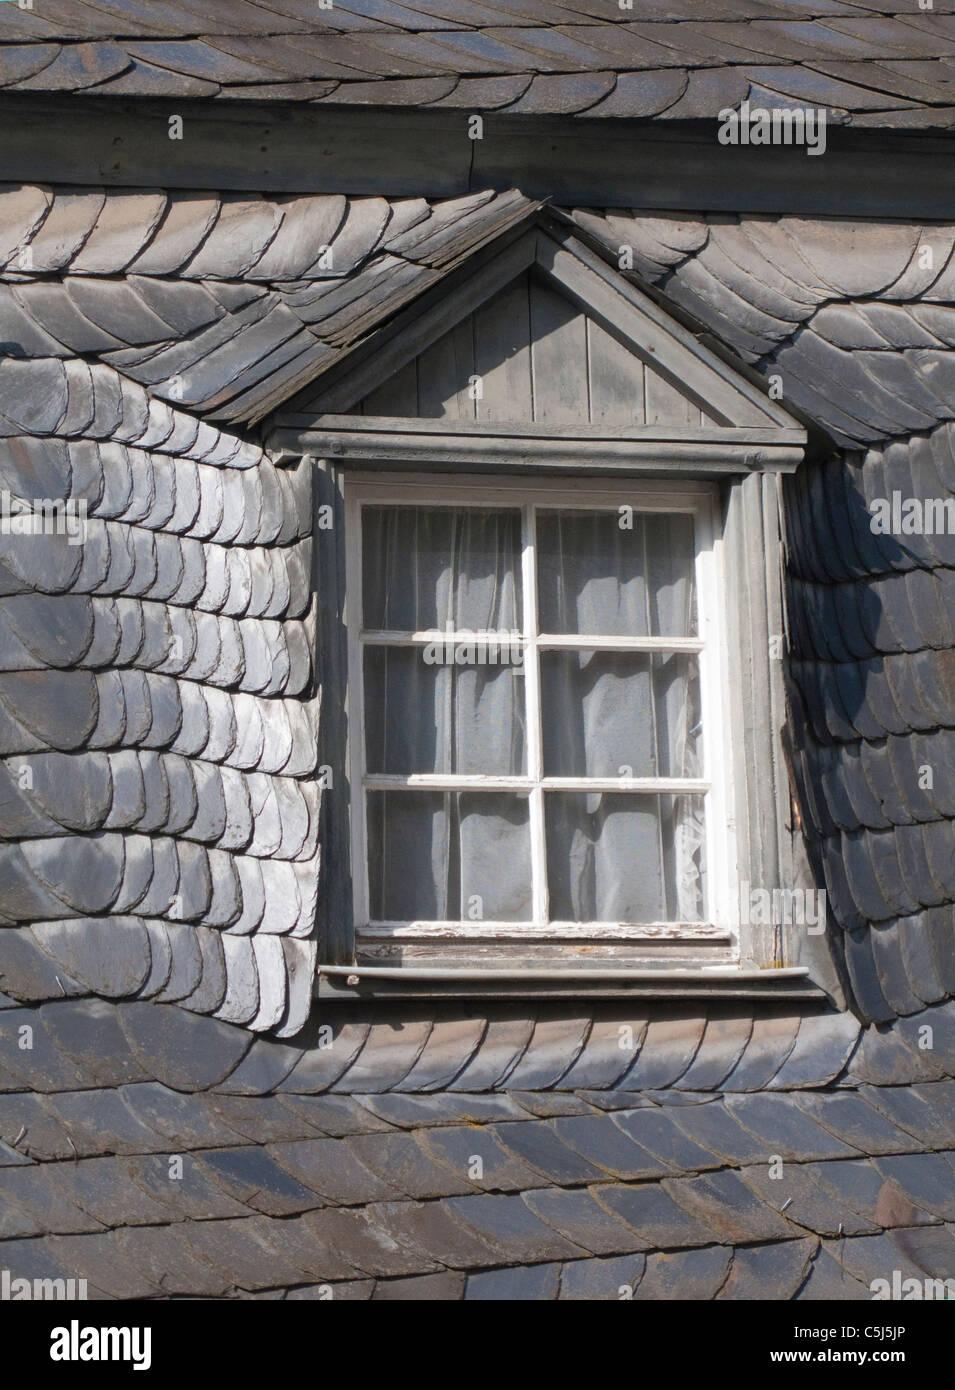 Mit Schiefern Gedecktes Dach, Dachfenster, Haus in Bernkastel-Kues, Mosel, Slated Dach, Fenster, Mosel, Stockbild